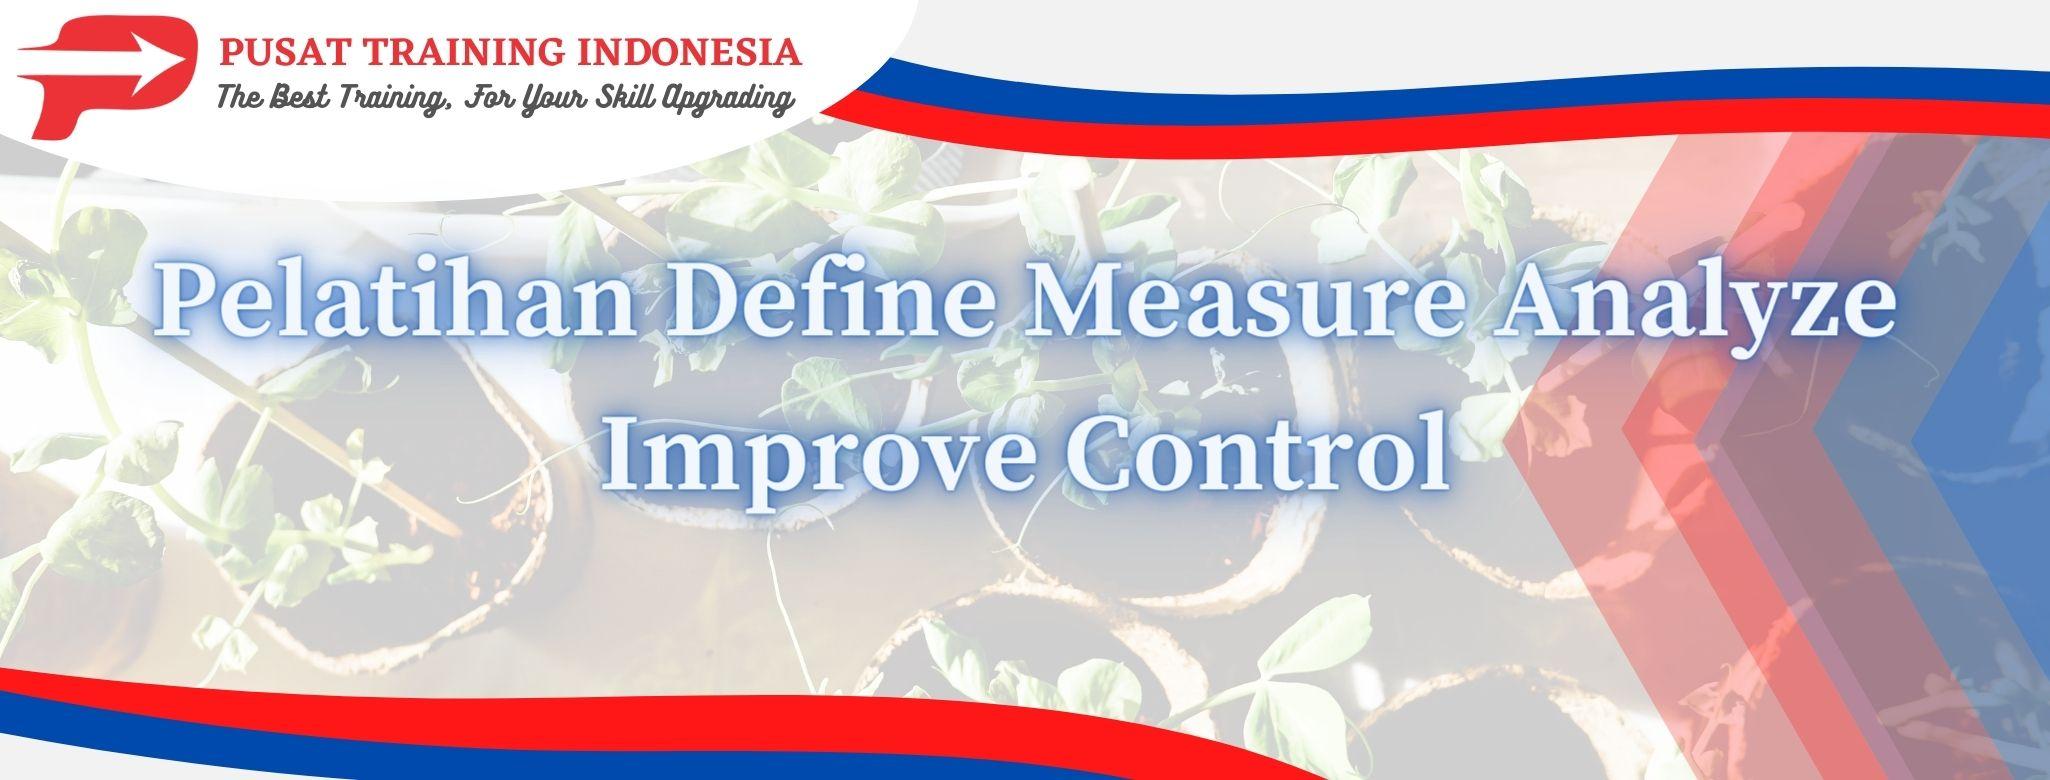 Pelatihan-Define-Measure-Analyze-Improve-Control